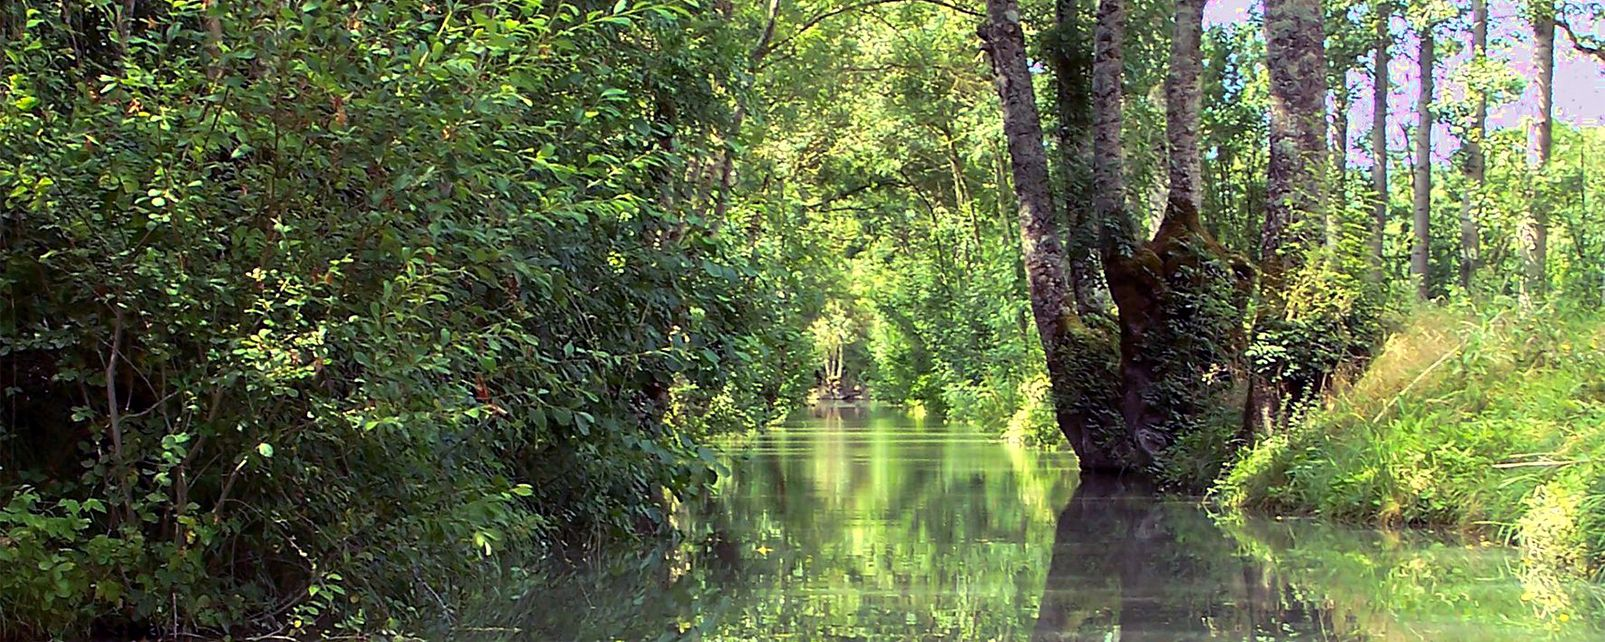 Le Marais Poitevin , Le marais poitevin , France